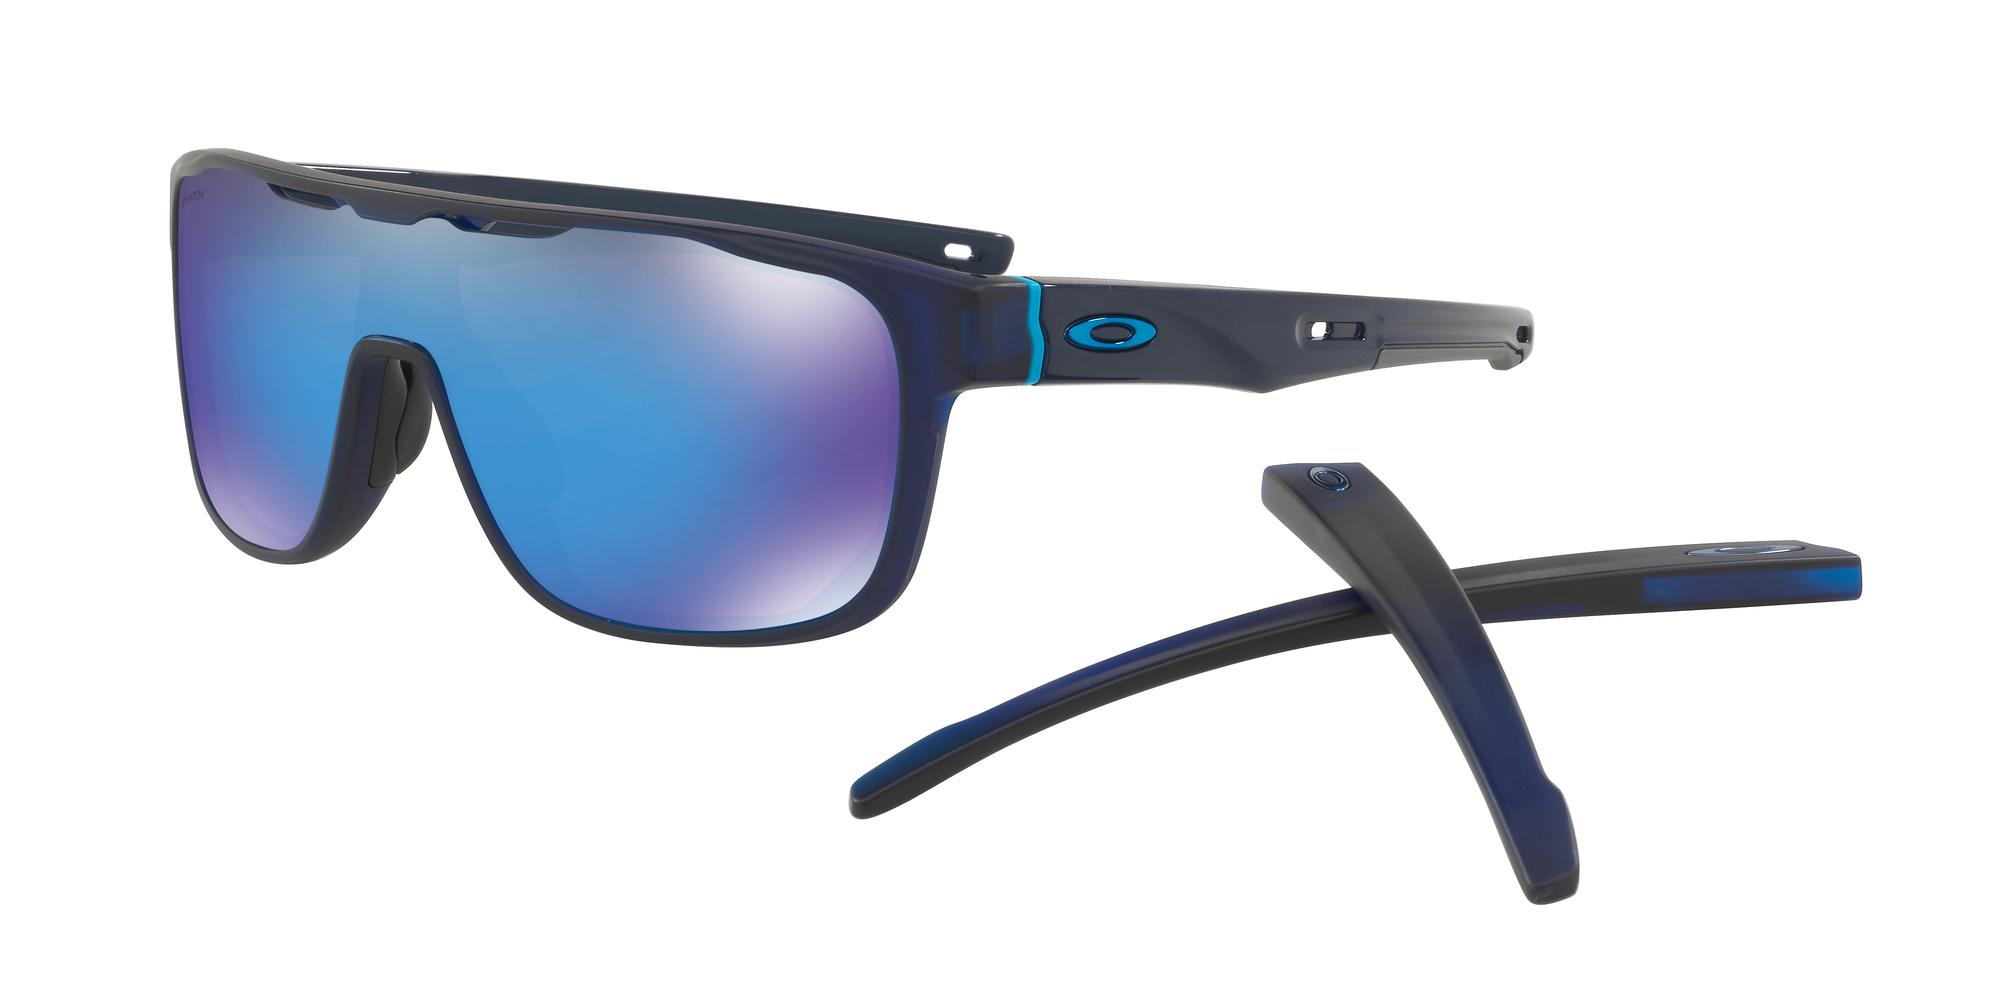 160deeac51 ... Crossrange Shield Cycling Glasses.    Sunglasses · Oakley